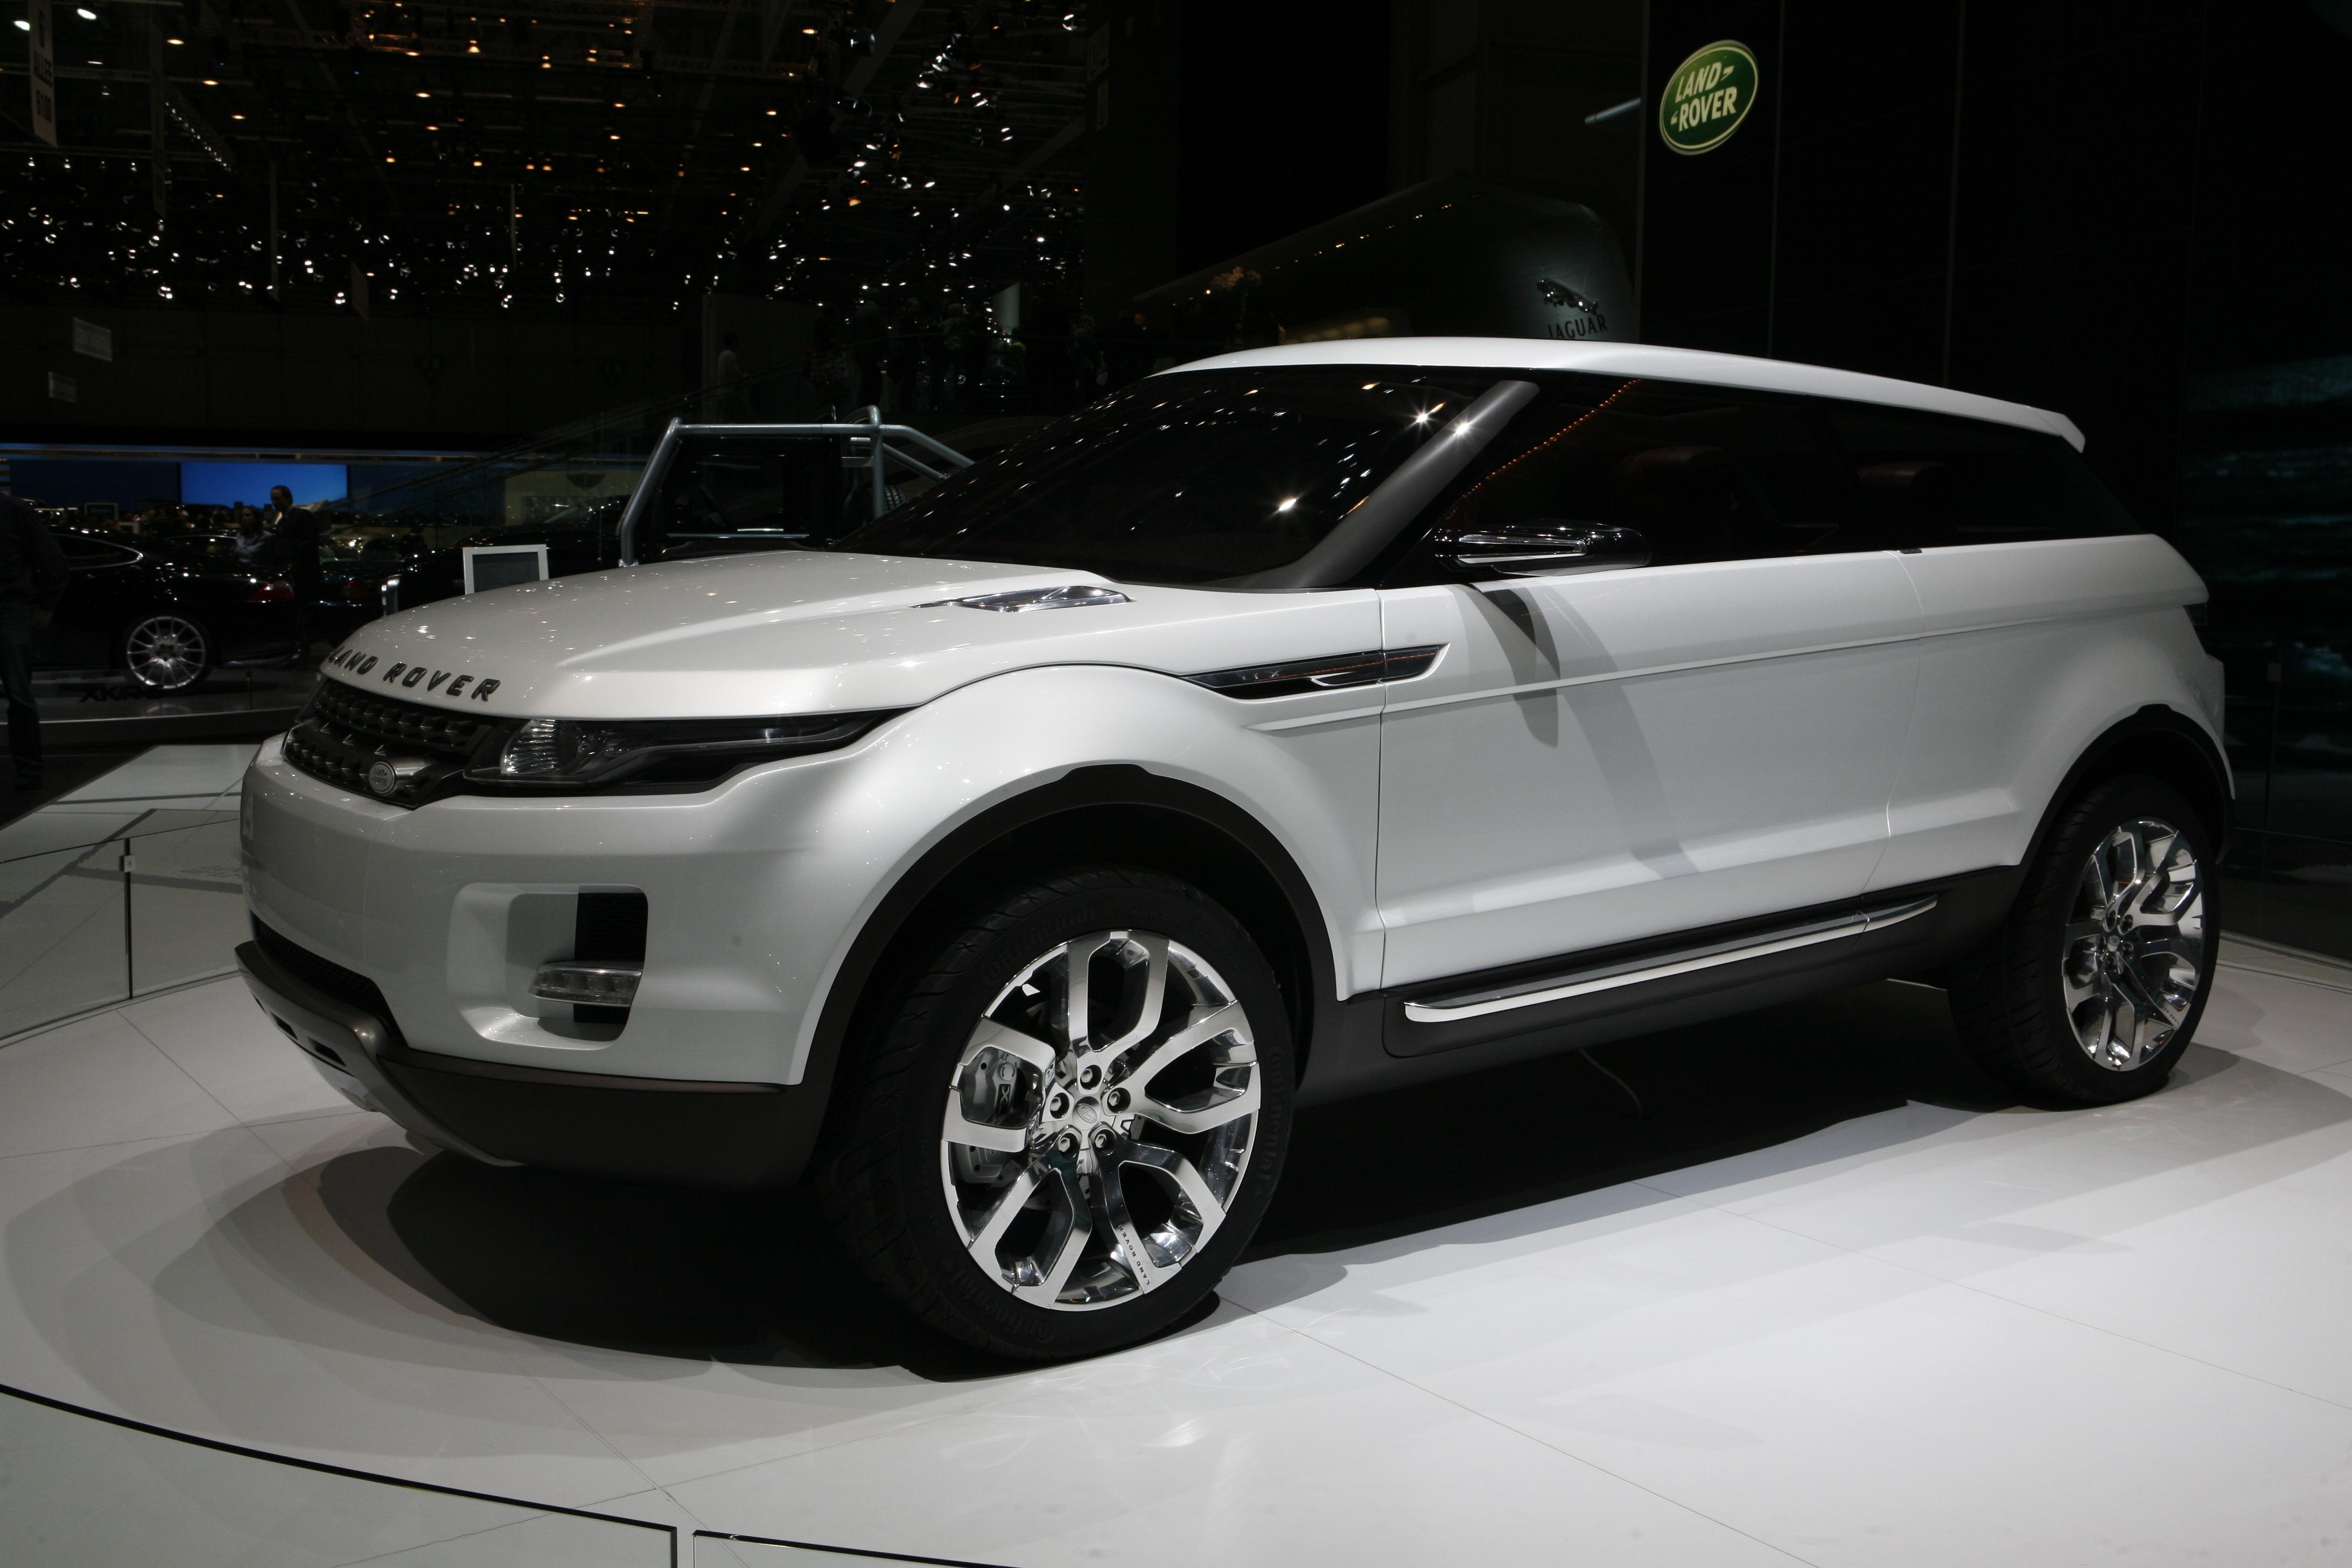 https://upload.wikimedia.org/wikipedia/commons/5/50/Land_Rover_mg_2159.jpg